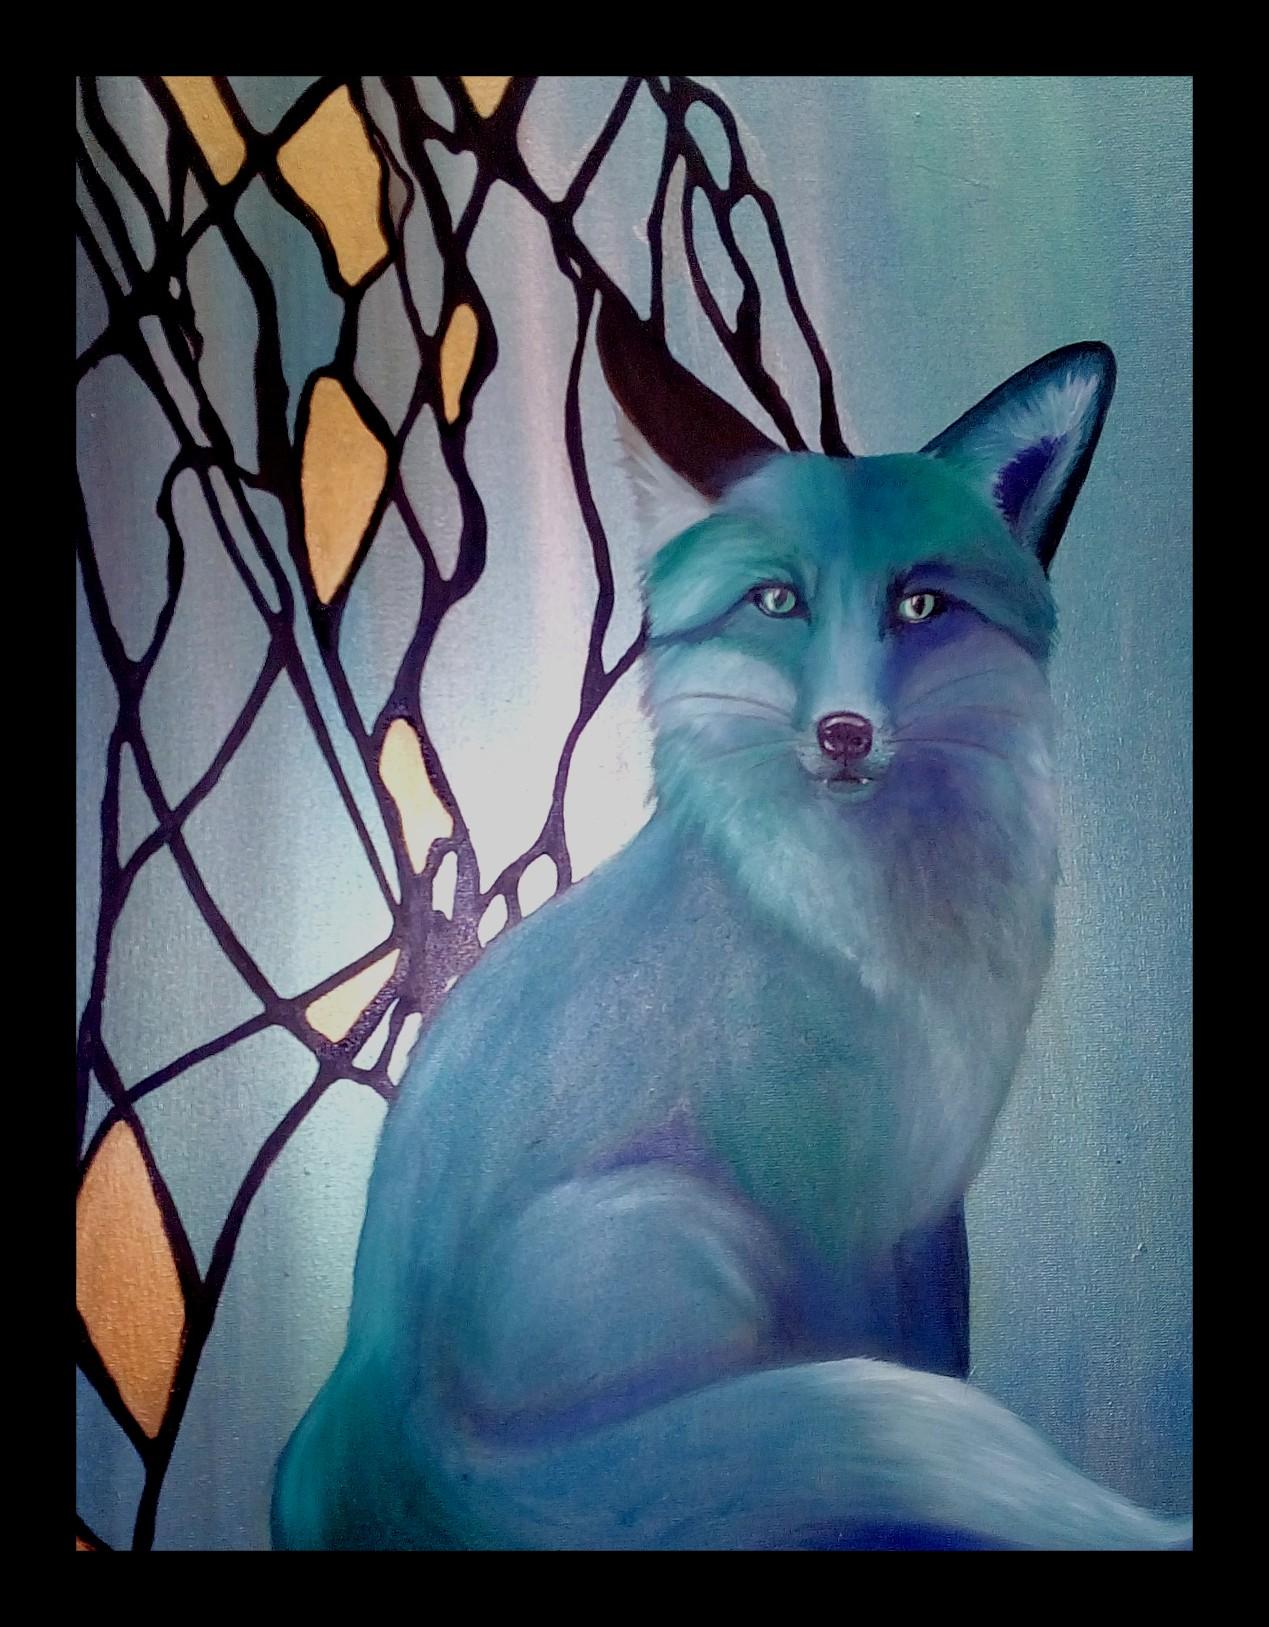 Fuchs, Öl auf Leinwand 40x50cm